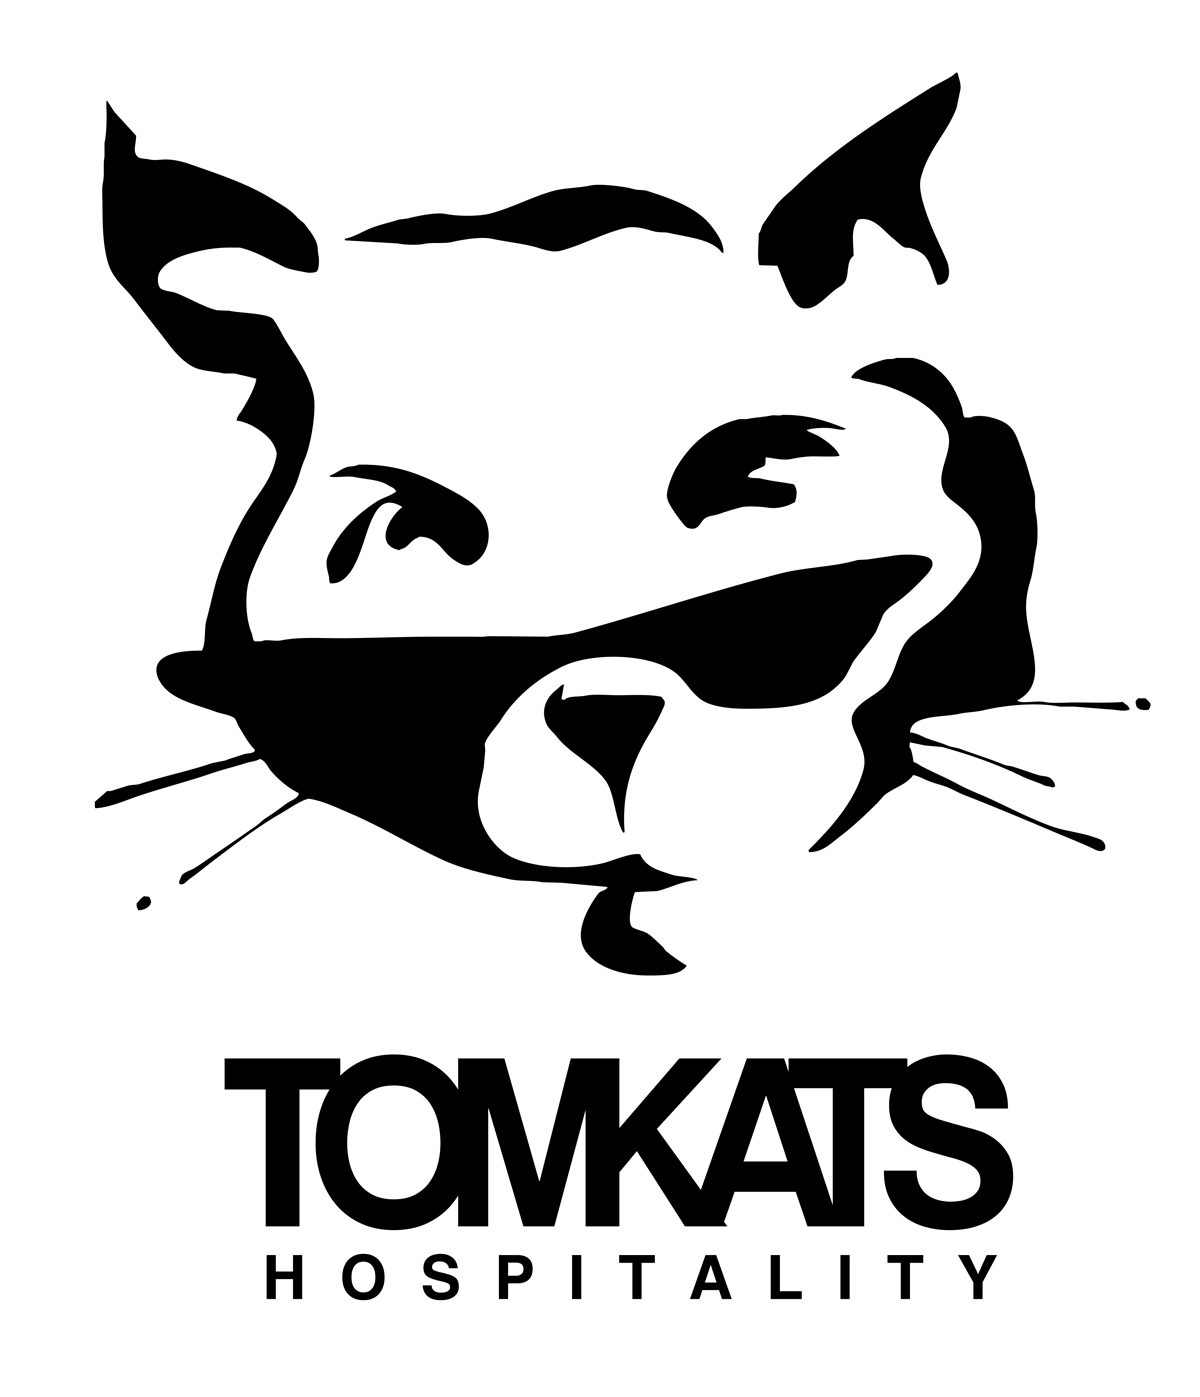 TomKats_Hospitality_Transparent_BG_logo.png